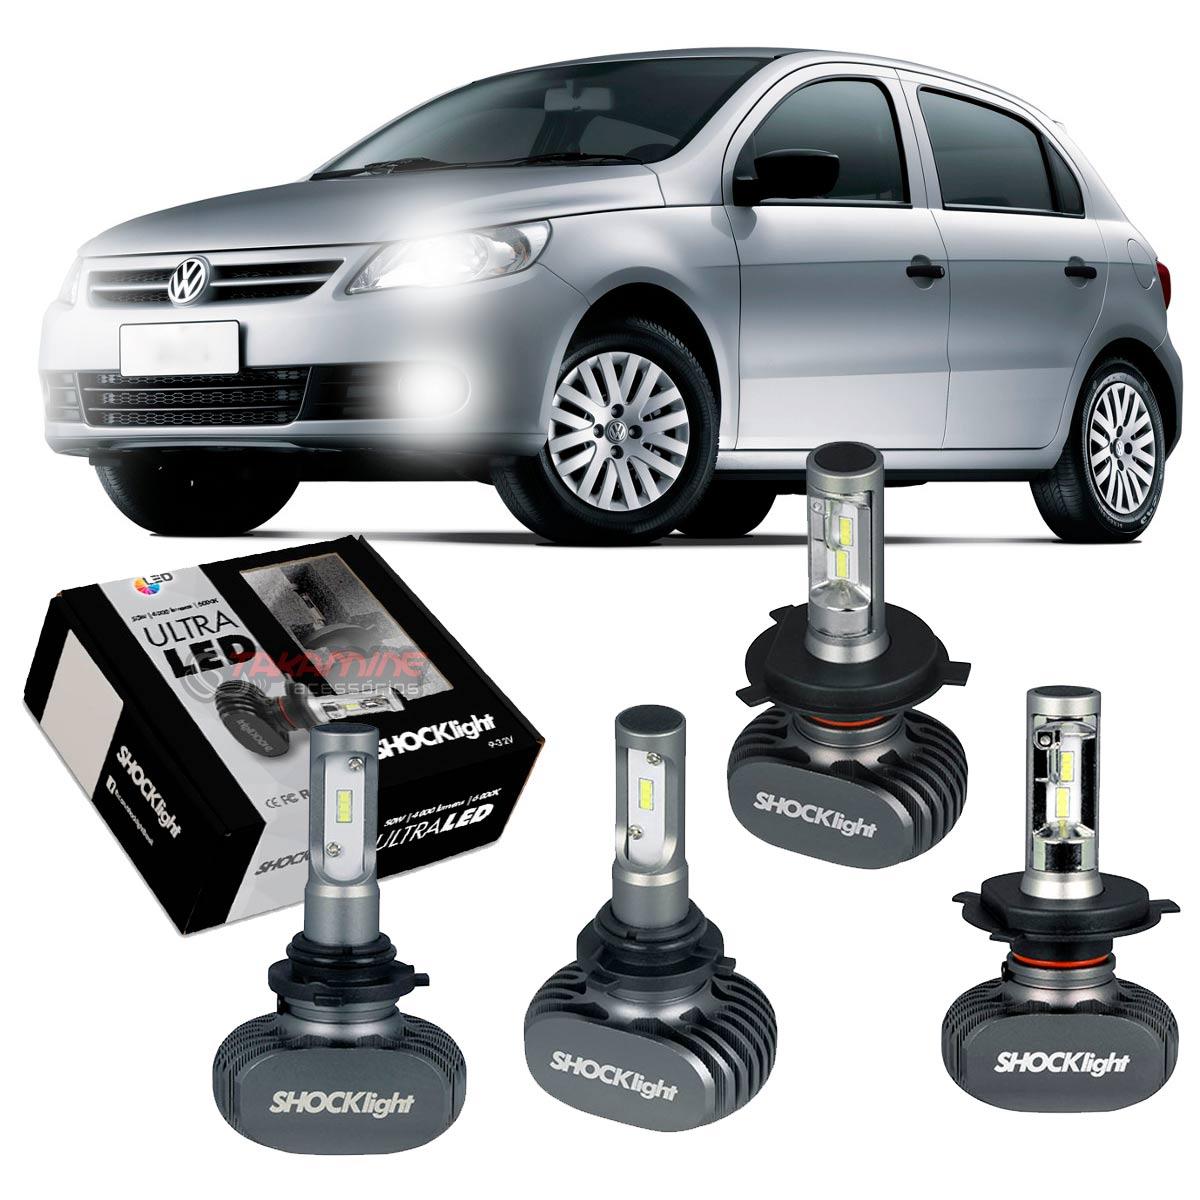 Kit Ultra LED Gol G5 2008 2009 2010 2011 2012 tipo xenon farol alto e baixo H4 50W